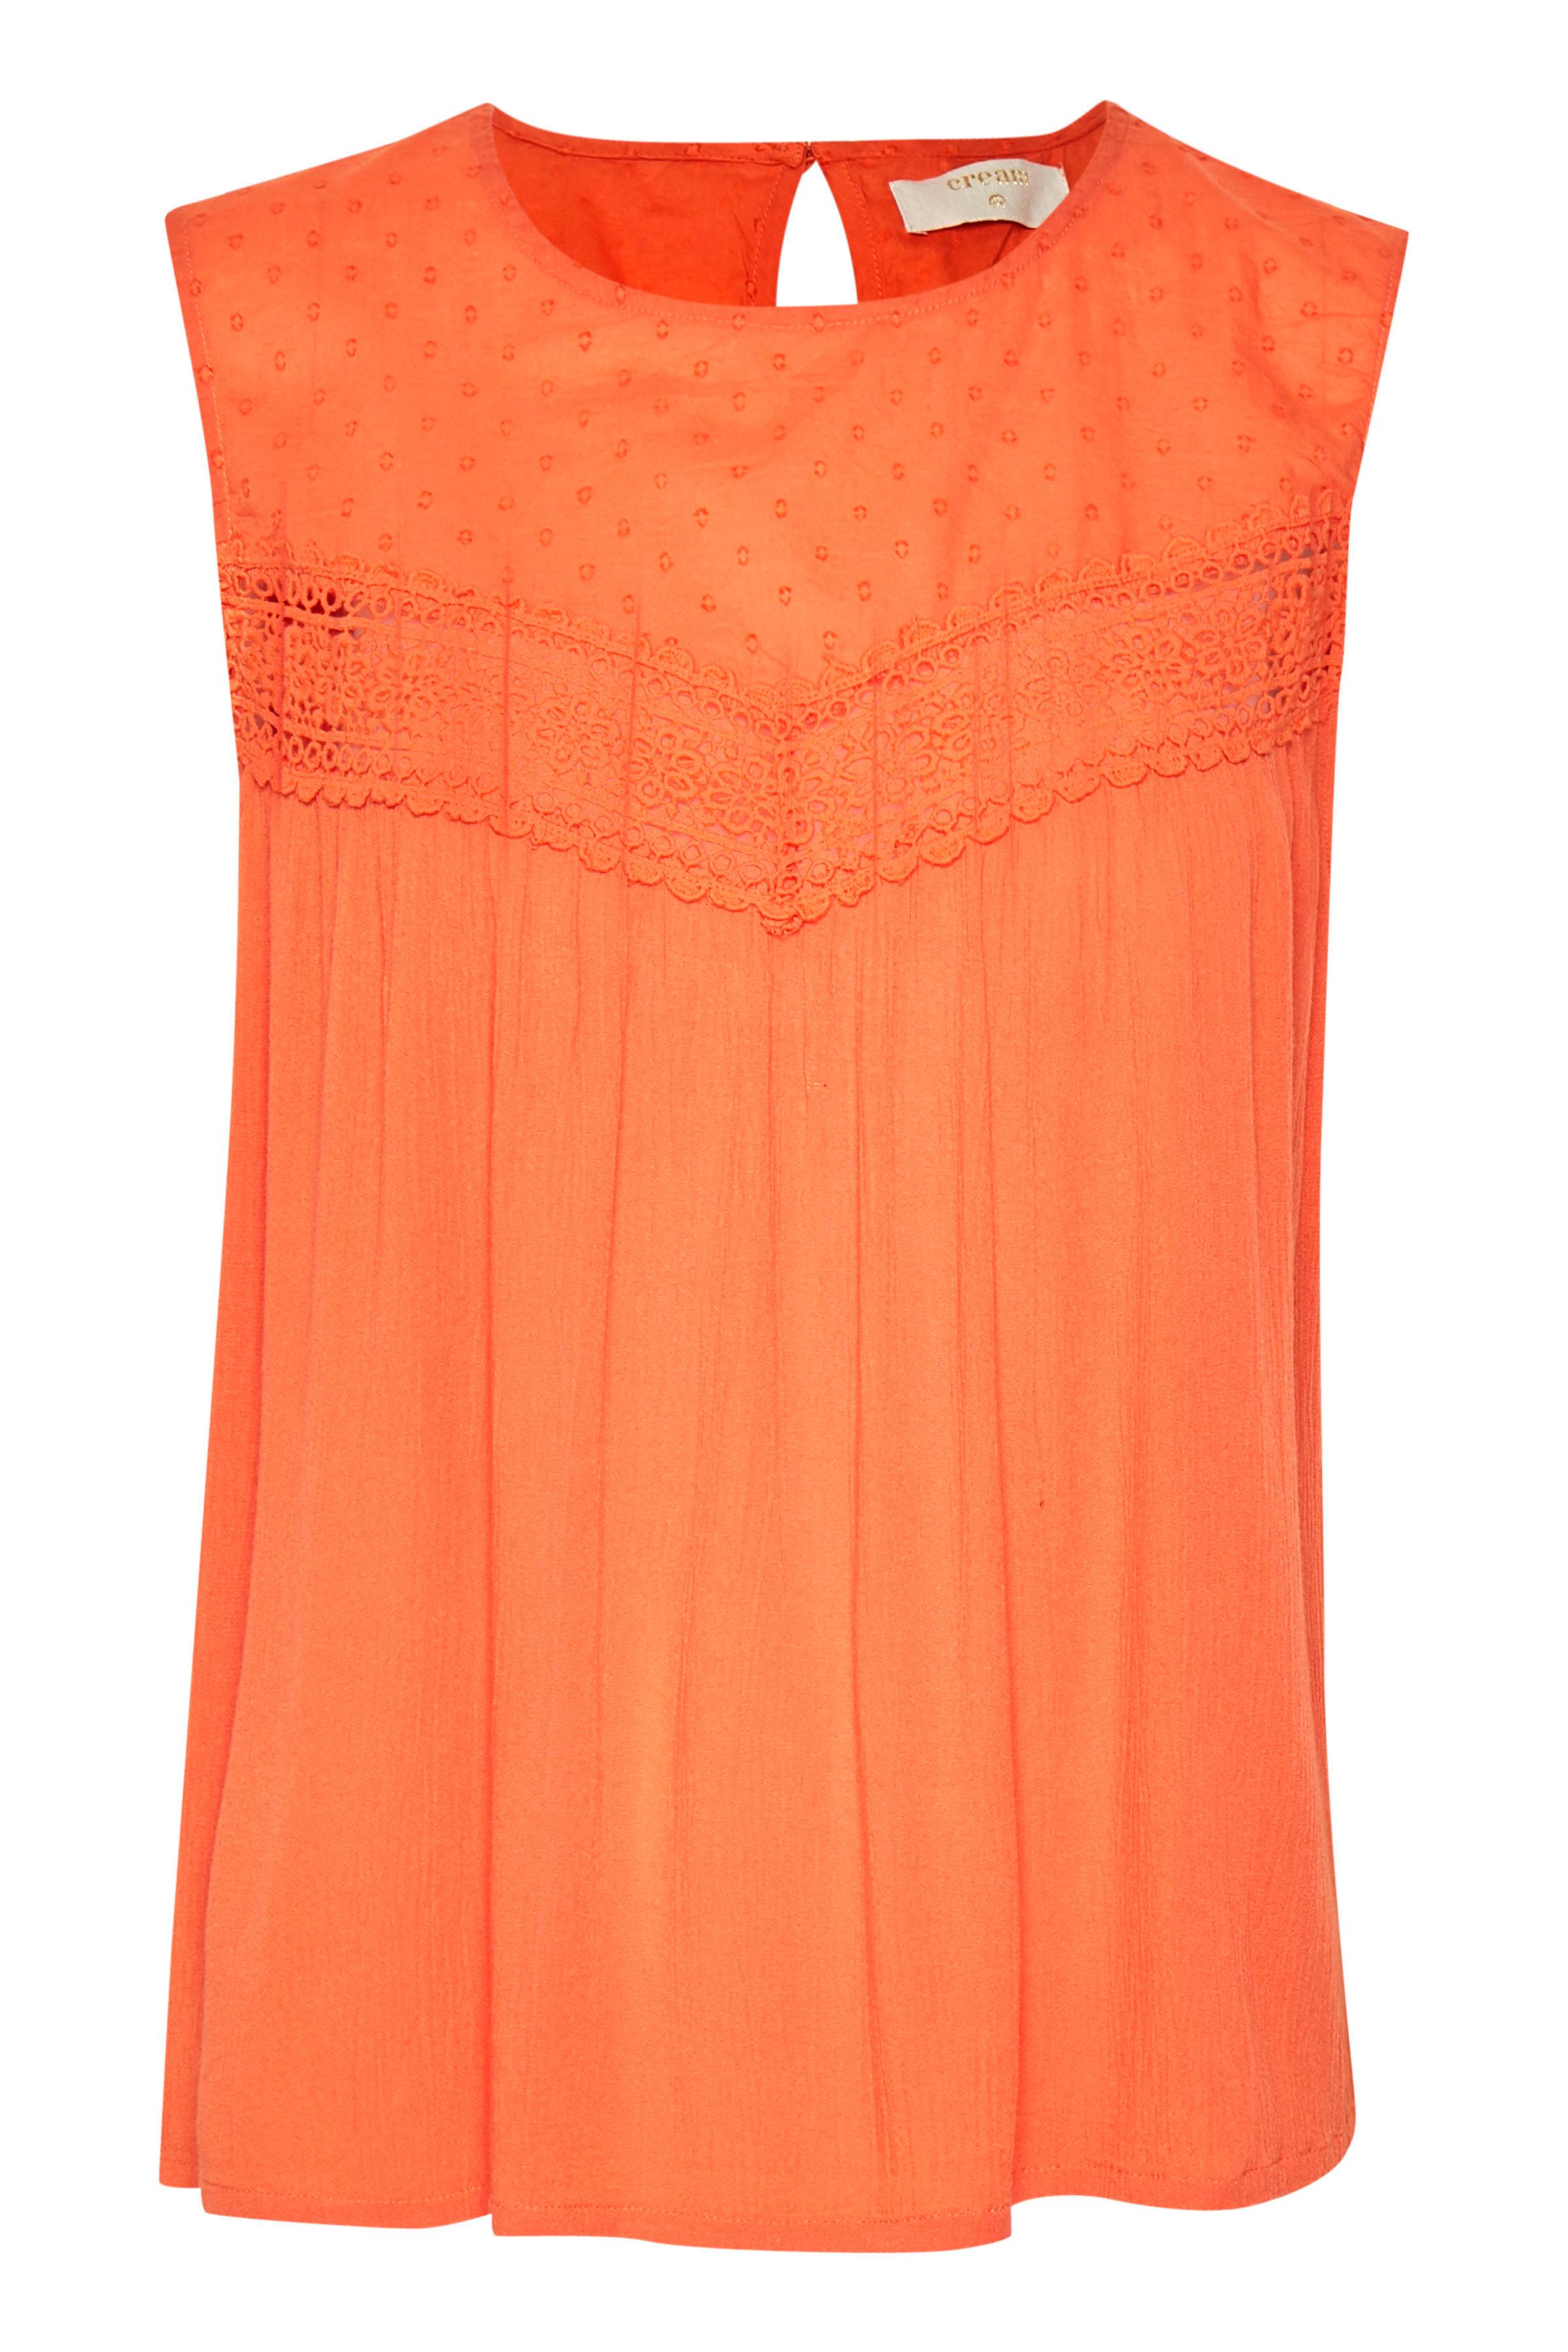 Cream Dame Top - Oranje